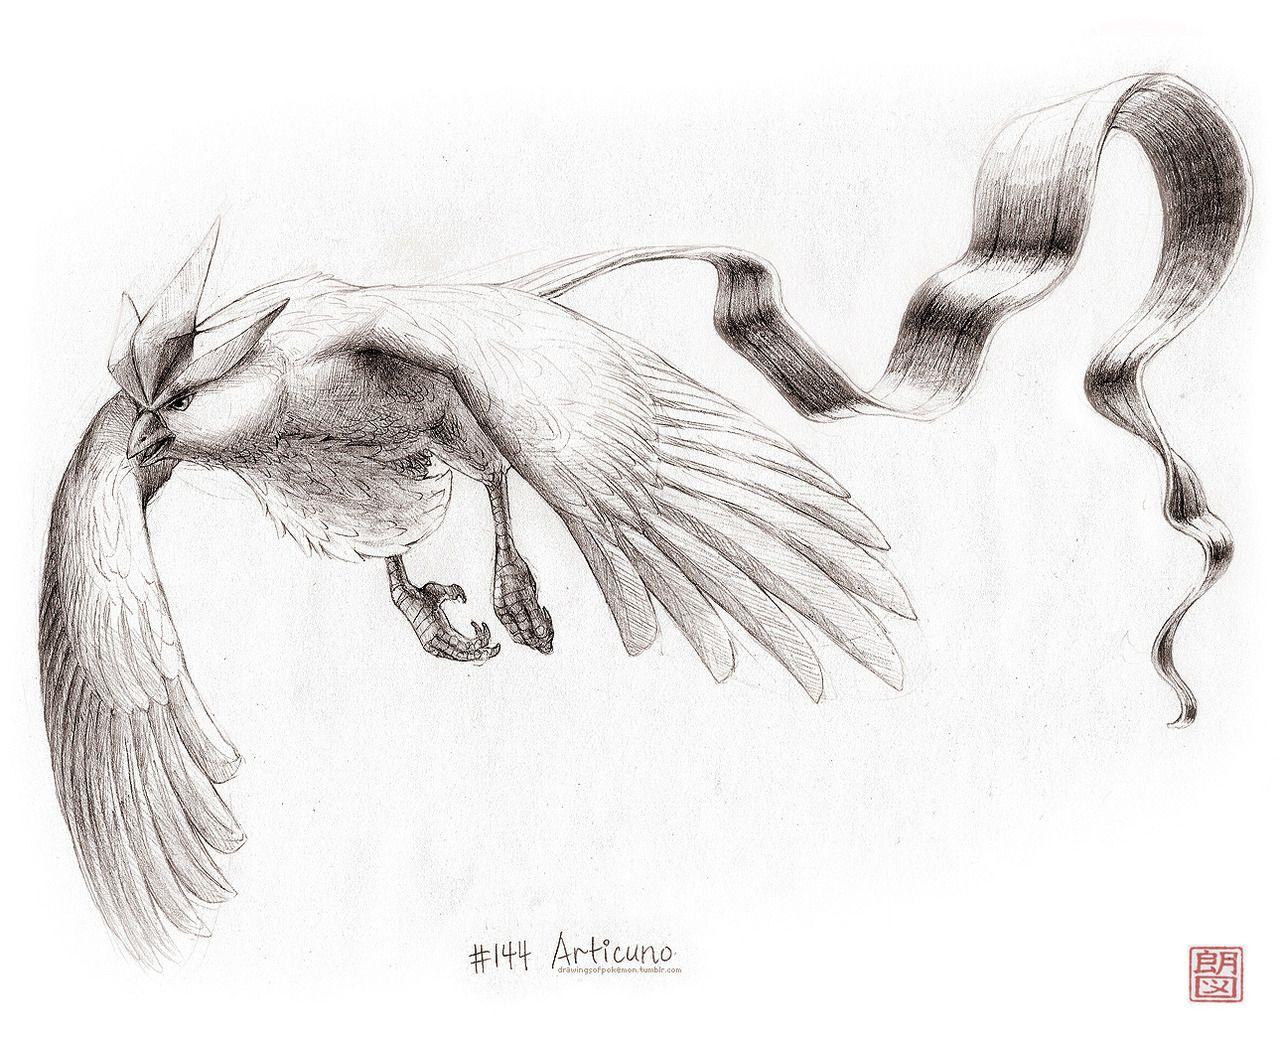 Drawings of Pokémon Pokemon drawings, Pokemon sketch